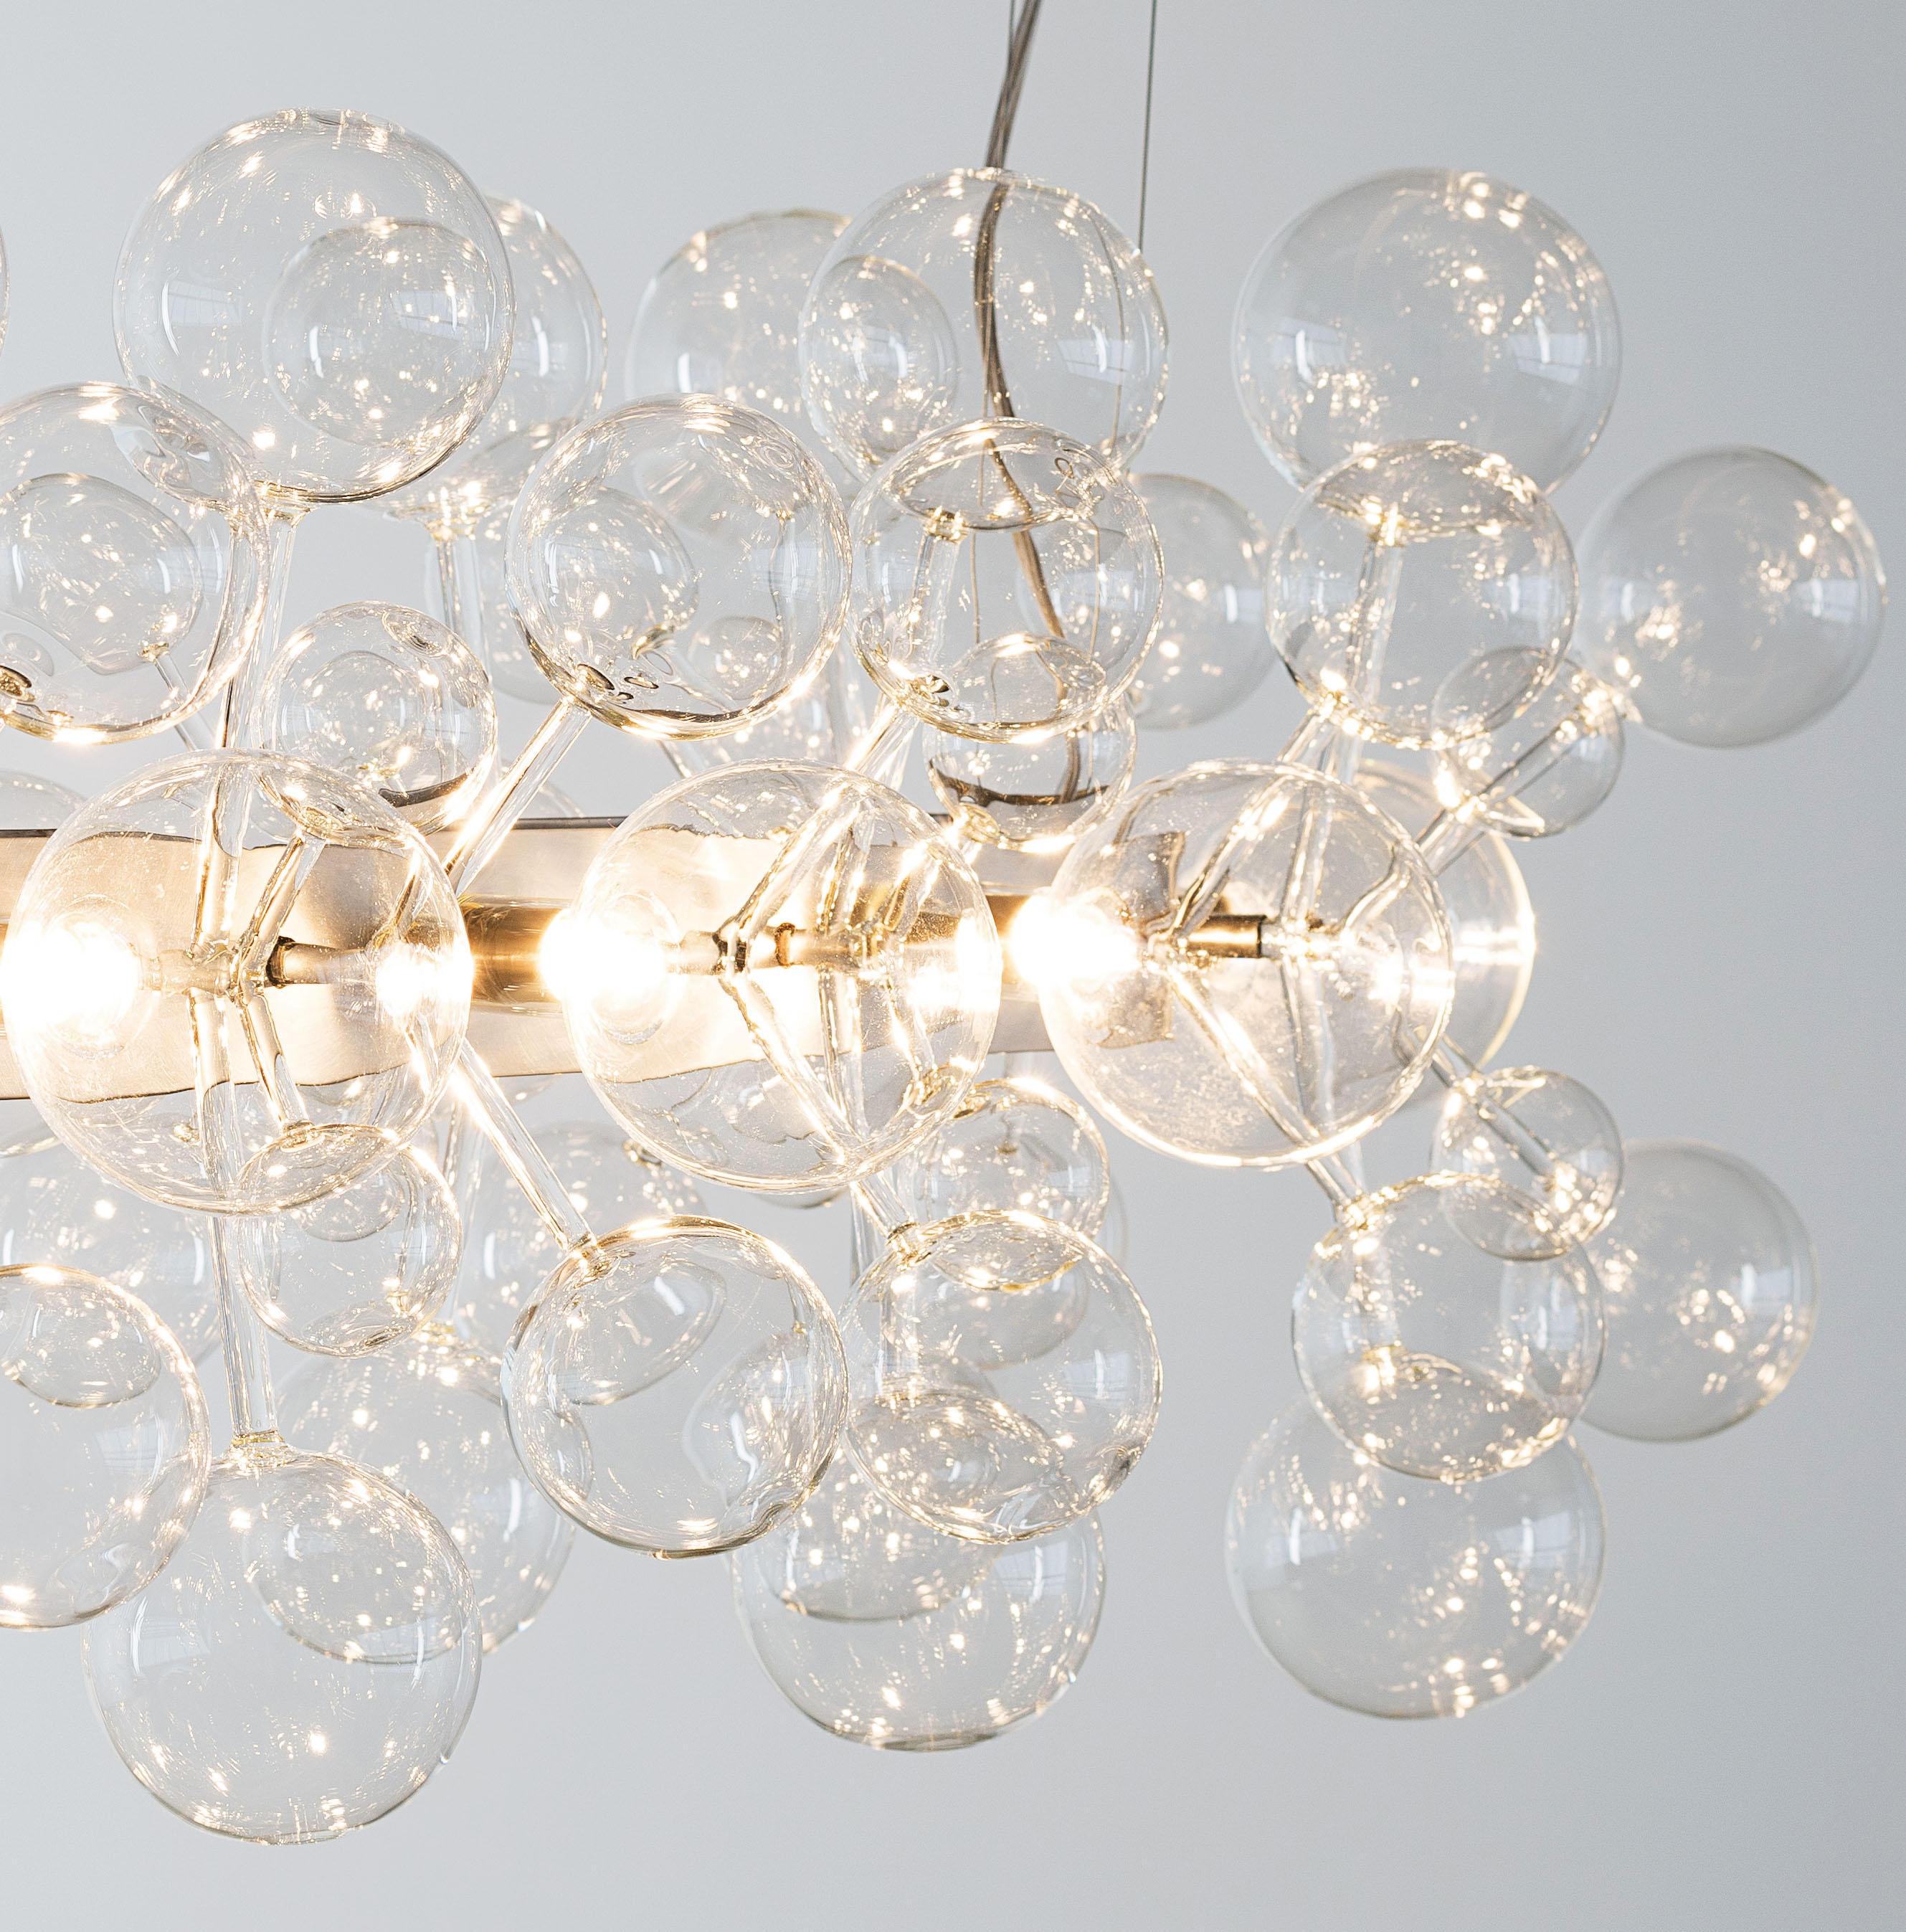 about lights light trubridge medium pendant brand cloud floating david lighting ceiling etheral